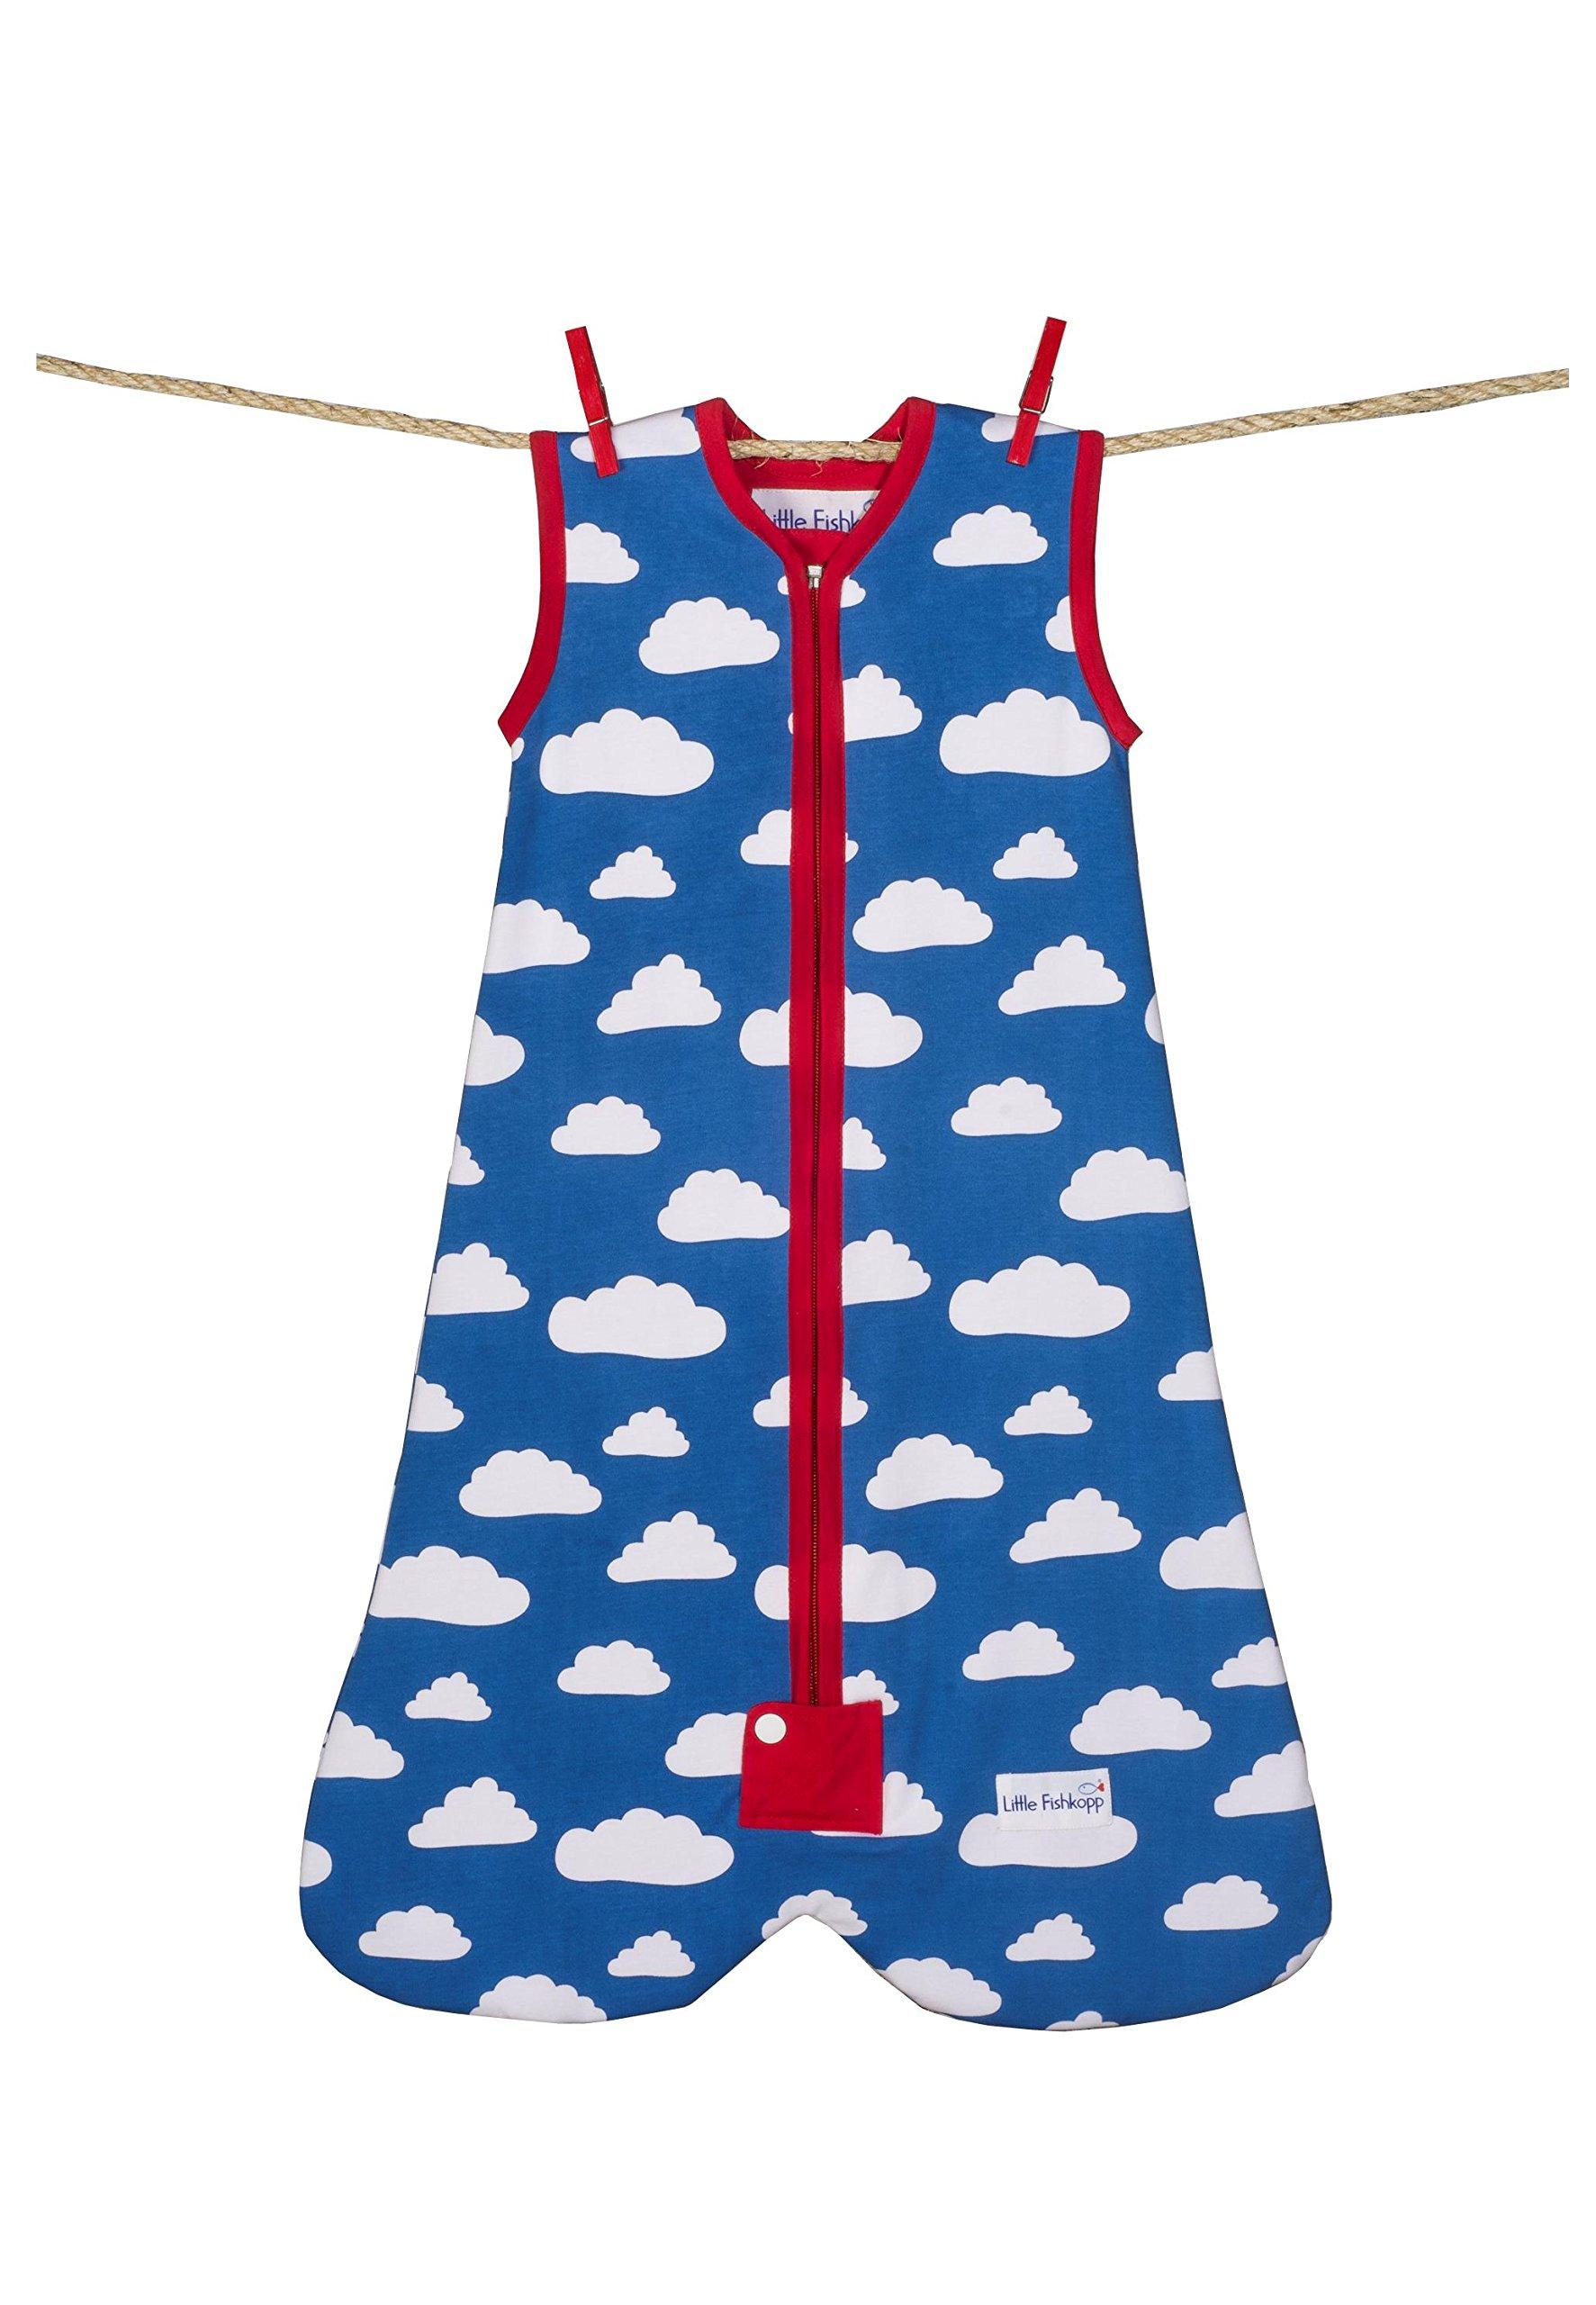 Little Fishkopp Organic Cotton Baby Sleep Bag, Clouds, 1.0 Tog, Blue, Large